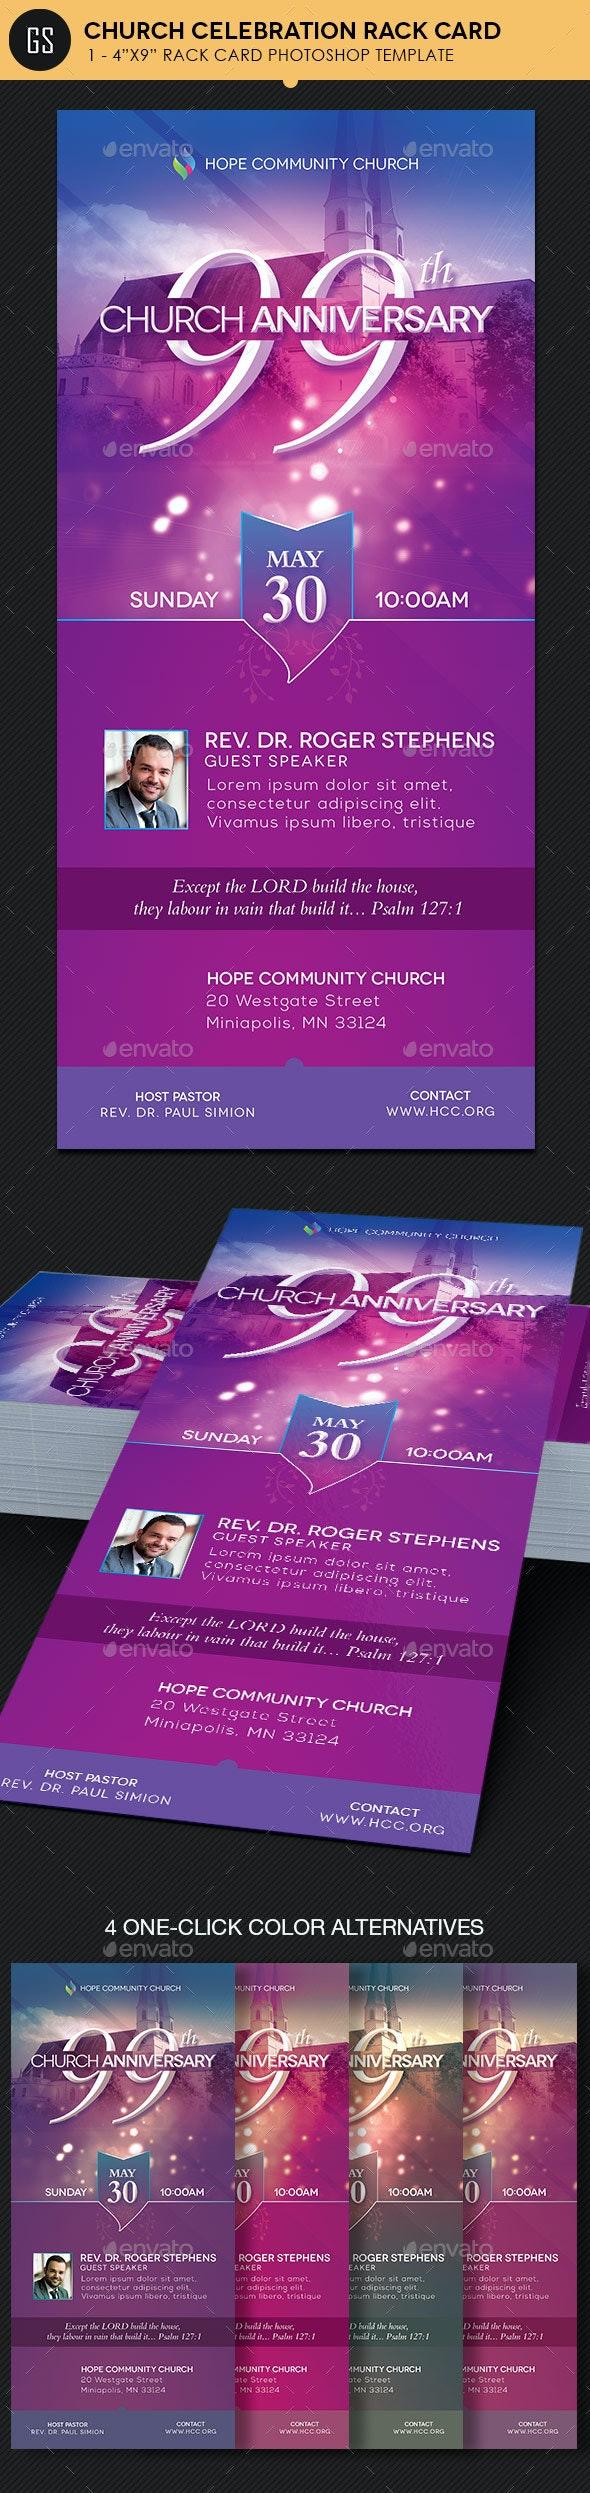 Church Celebration Rack Card Photoshop - Church Flyers